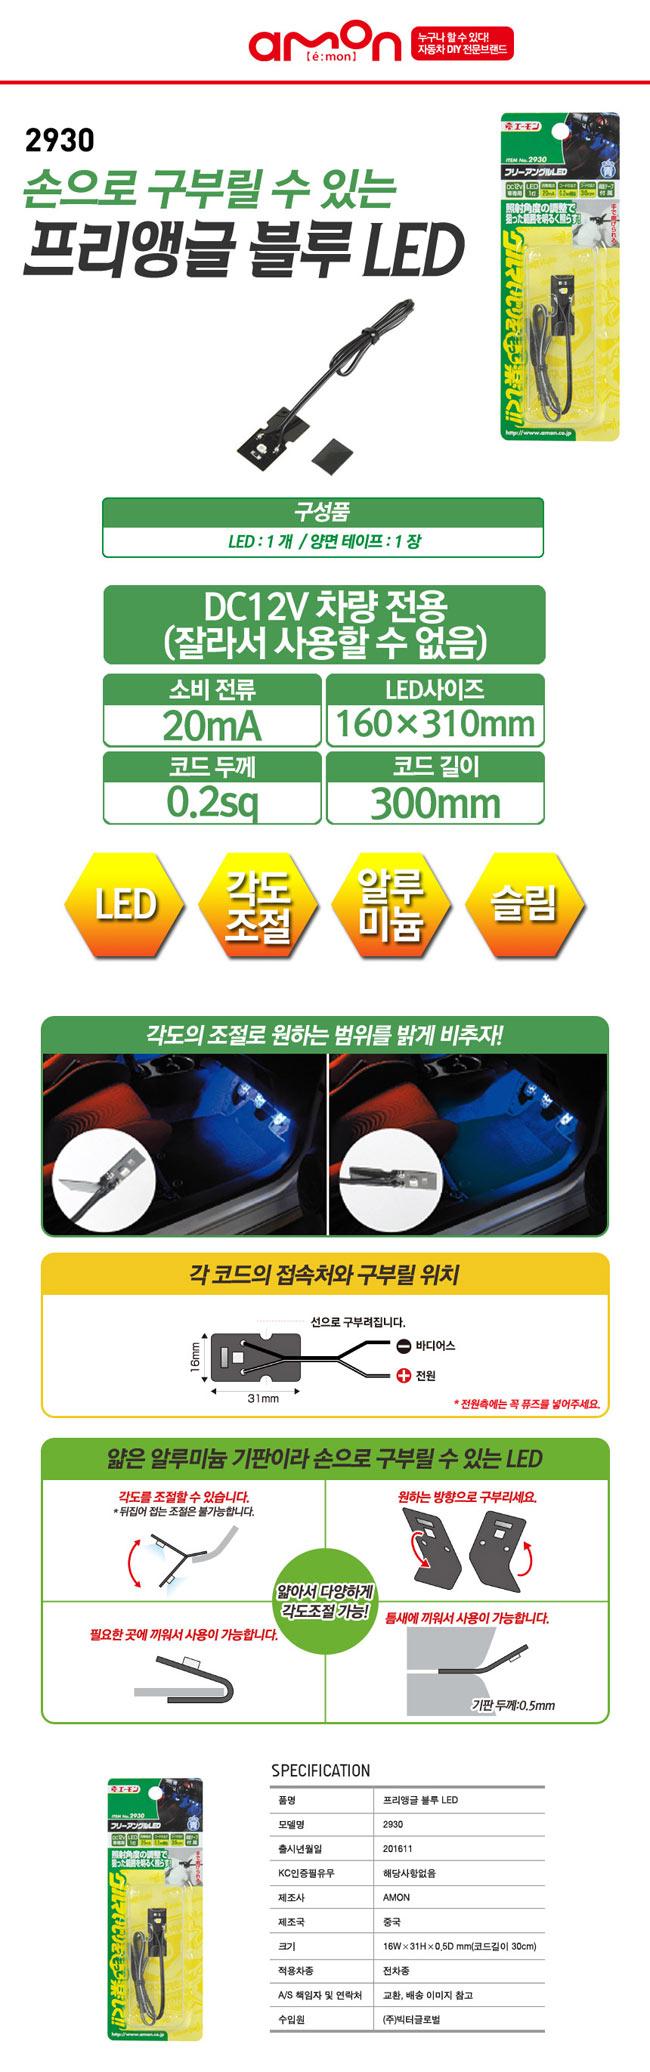 AMON 2930 프리 앵글 블루 LED